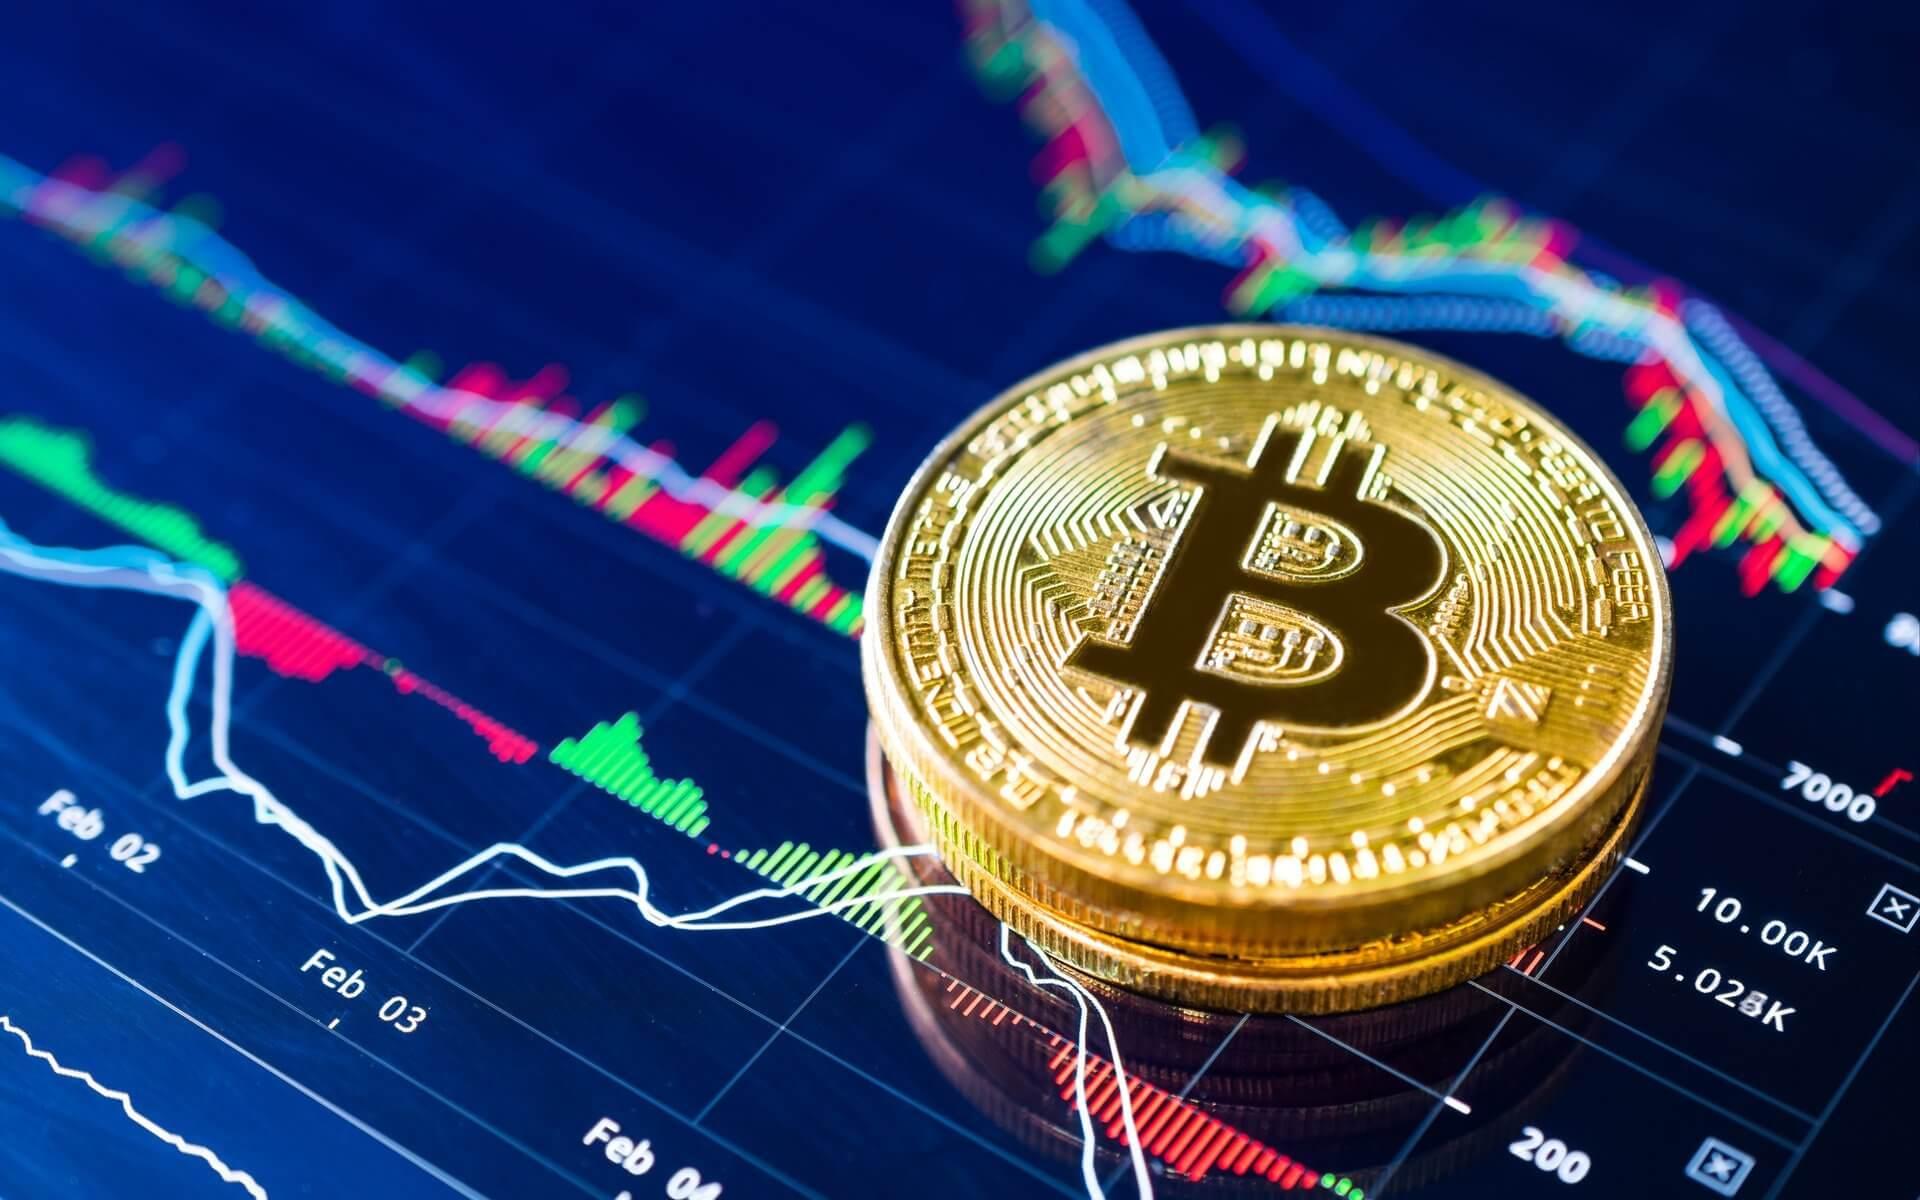 btc bitcoin işlem hacmi yüzde 75 yükseldi